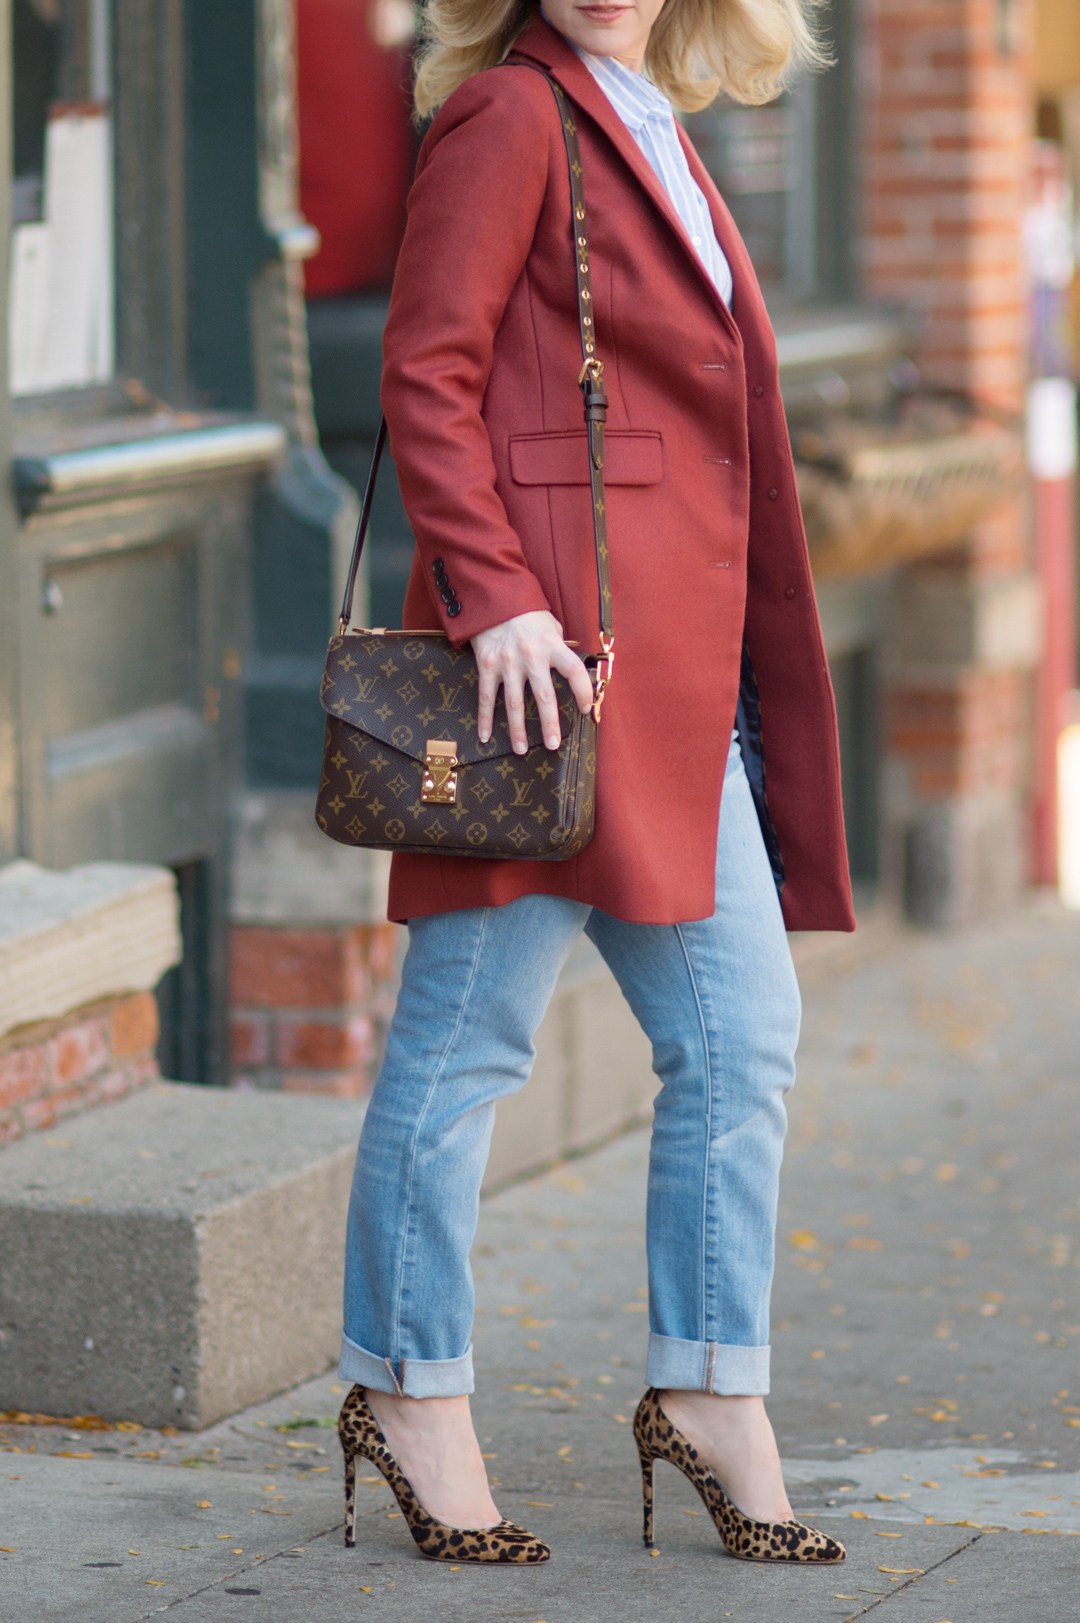 b42356edc29 Petite Fashion and Style Blog